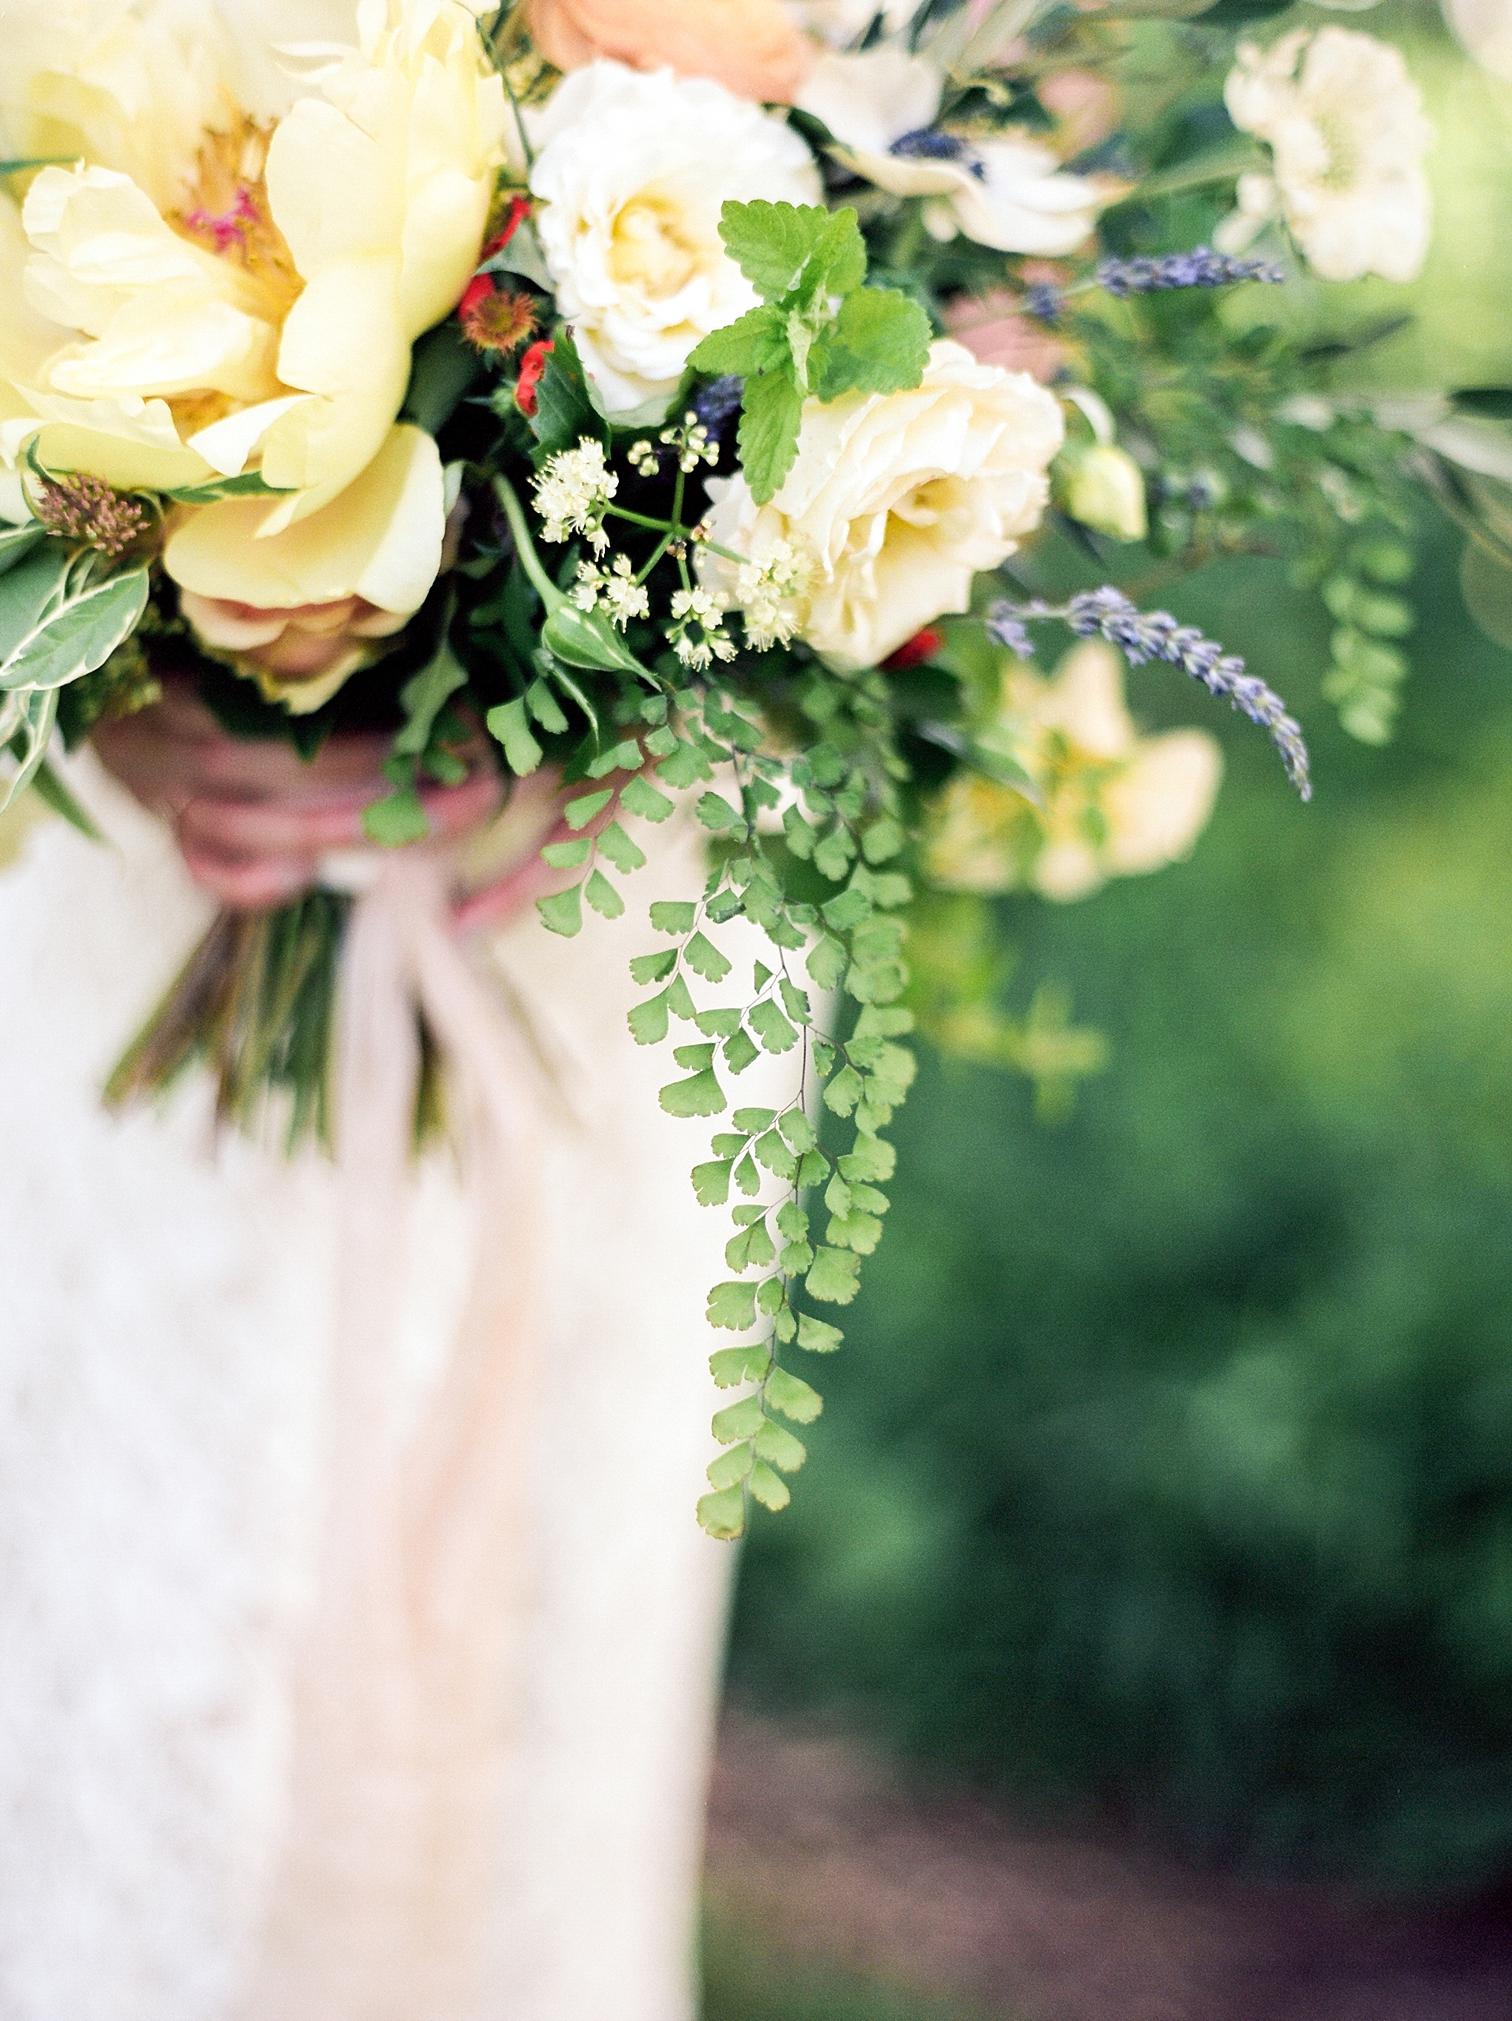 Outdoor Wedding Details, Colorado Mountain Weddings, Danielle DeFiore Photographer, Destination Wedding Photographers, Weddings in Boulder Colorado, Outdoor Ceremony, Film Photographer, Summer Wedding Bouquet